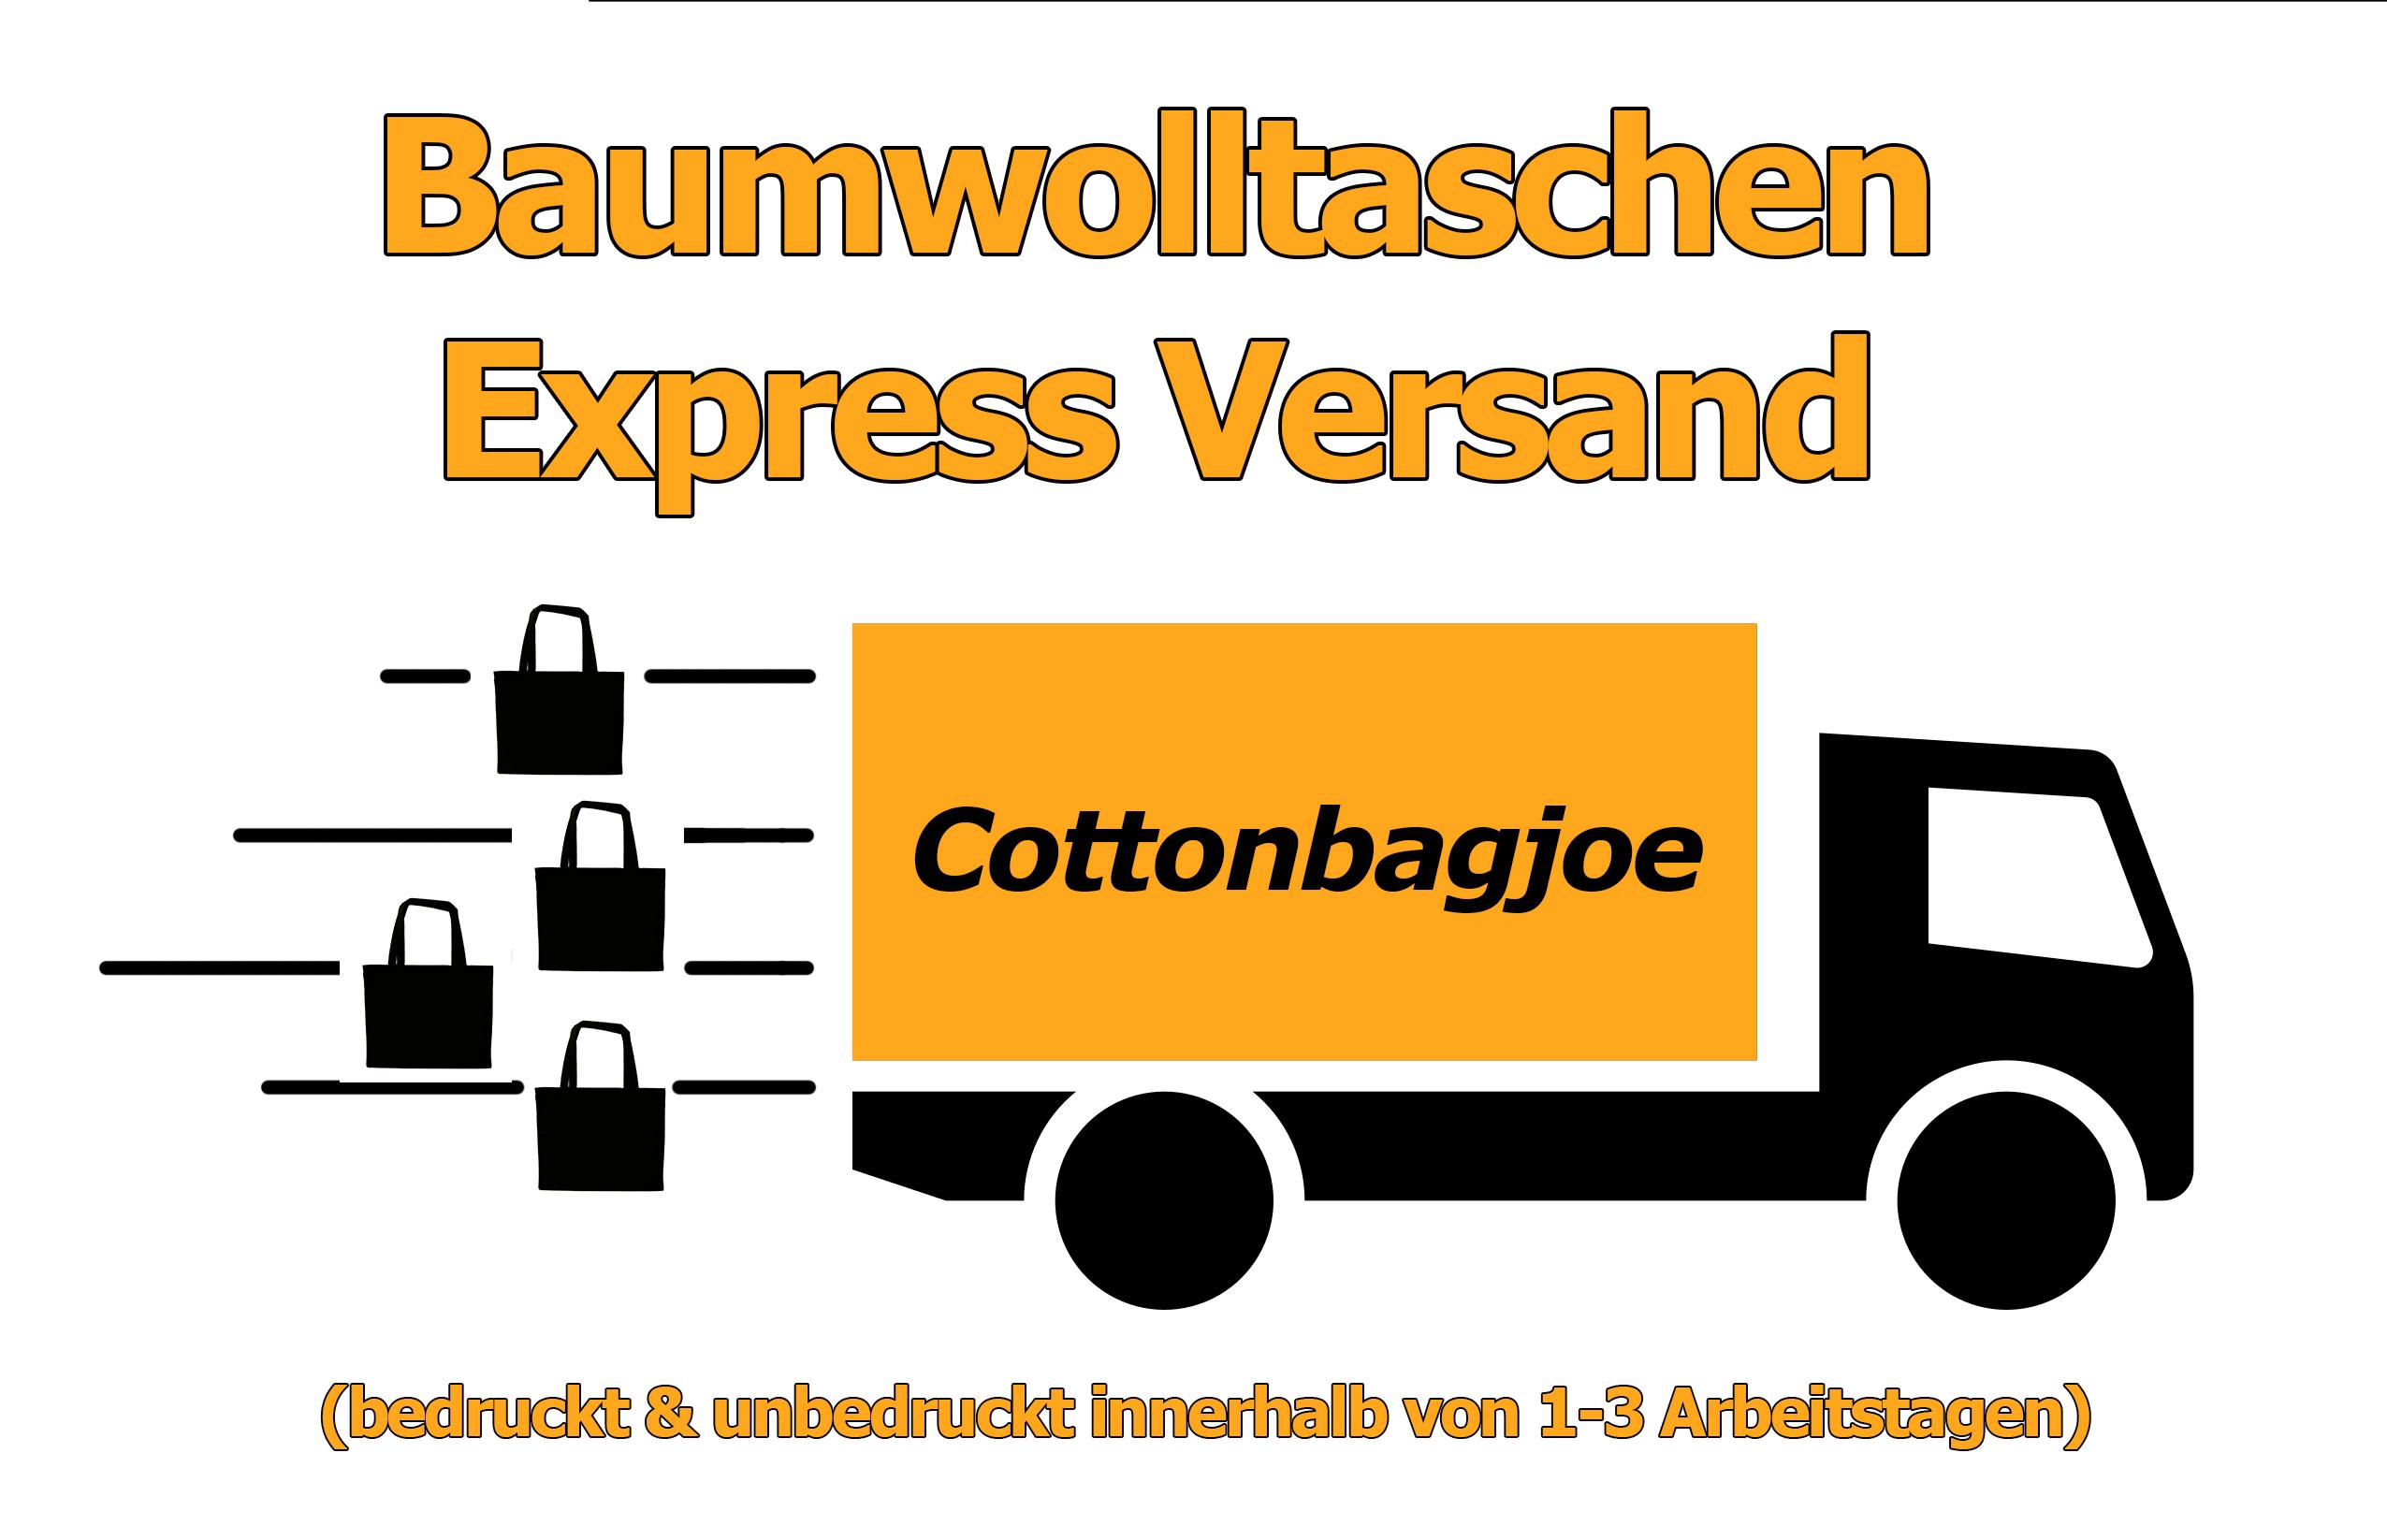 Baumwolltaschen bedrucken Express Versand Cottonbagjoe Bestellung